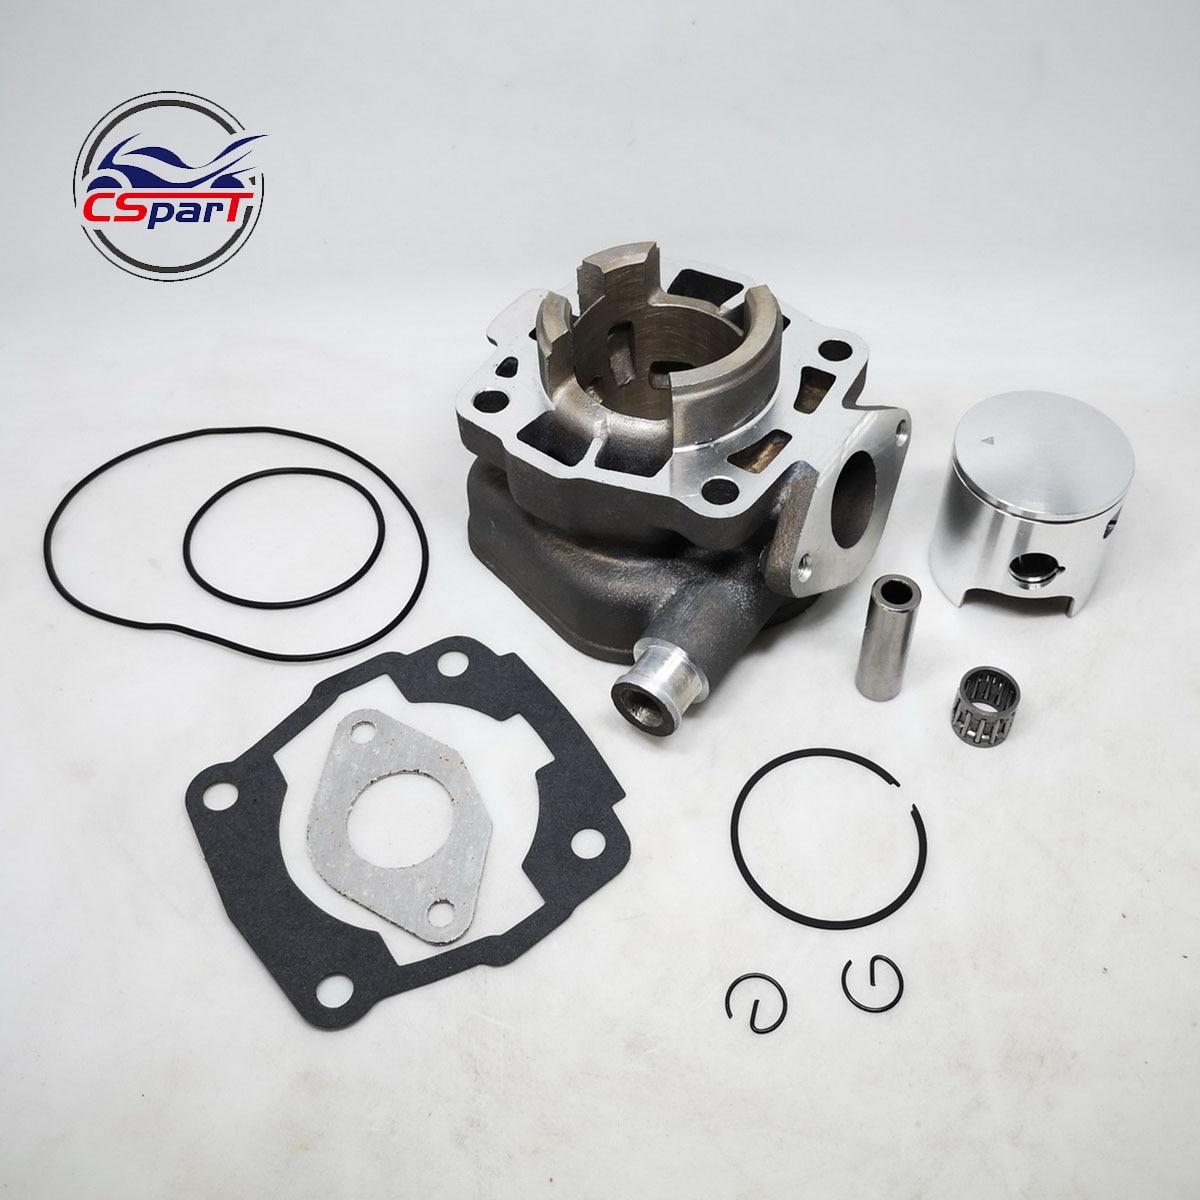 Kit de gran diámetro de 45mm para KTM 50CC a 65CC juego de juntas de anillo de pistón de cilindro para KTM 50 SX Pro Junior Senior